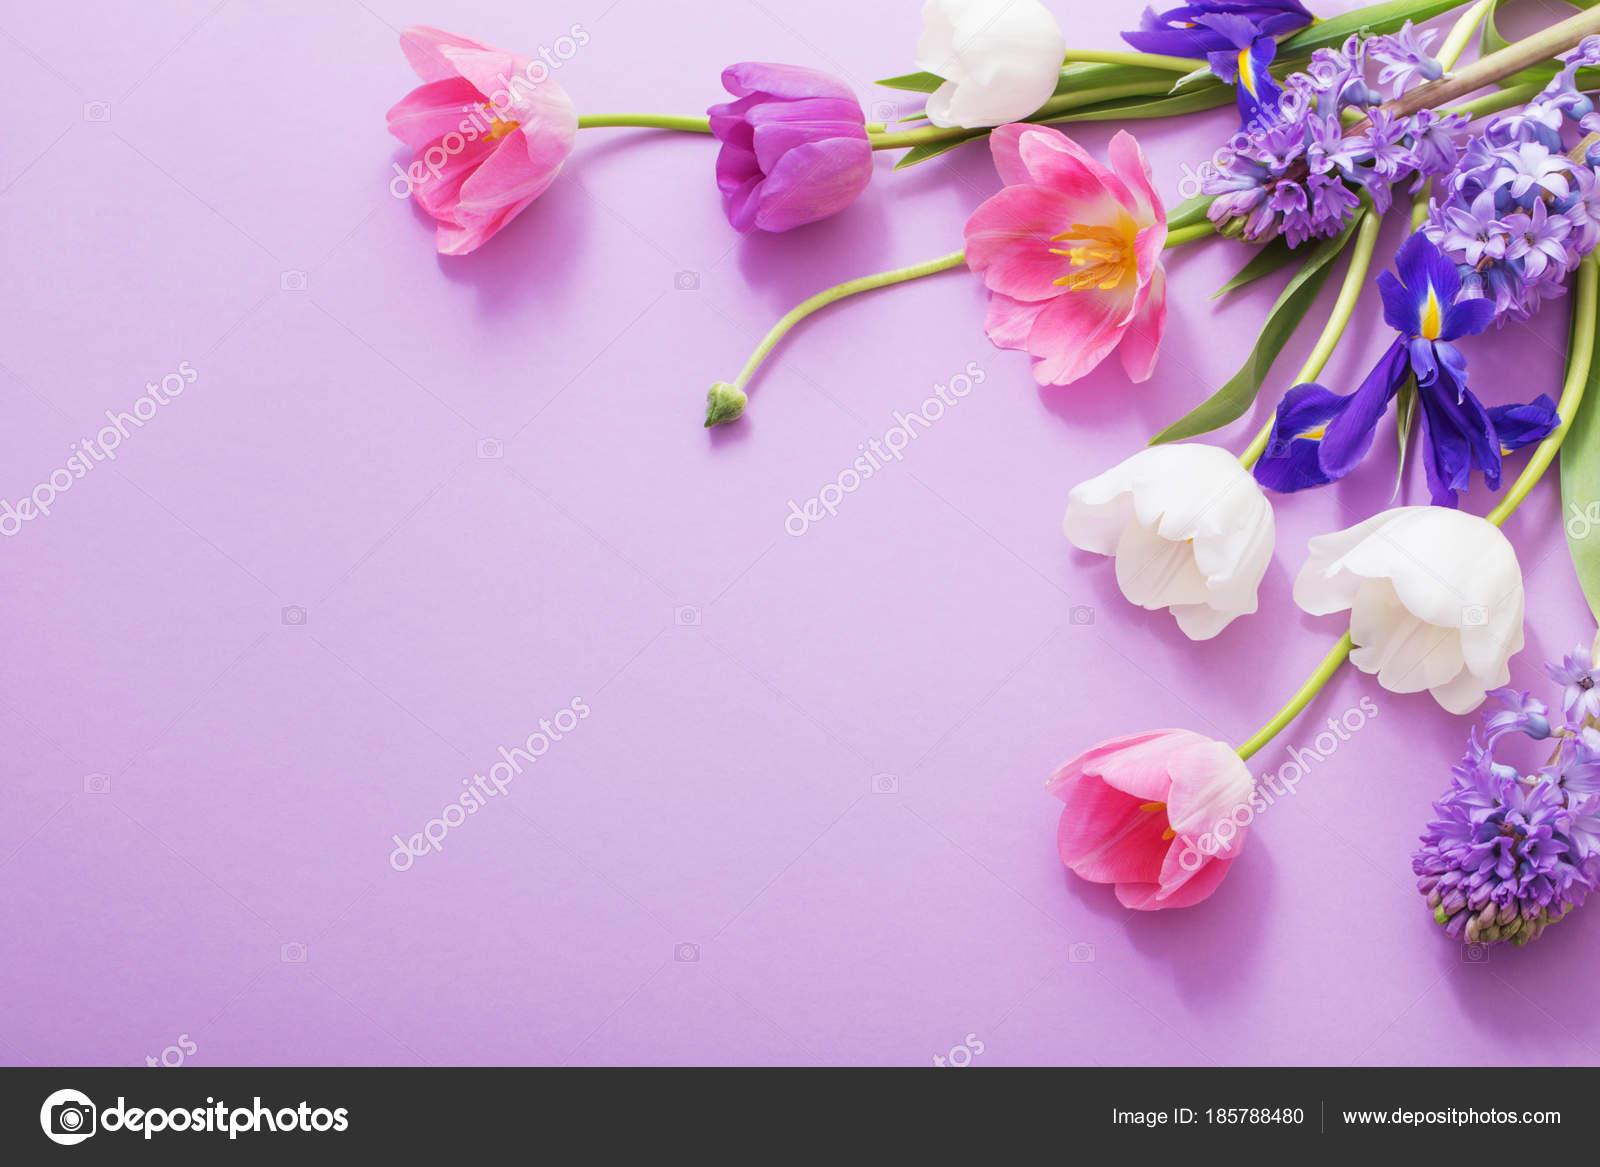 Beautiful Flowers On Paper Background Stock Photo Kruchenkova